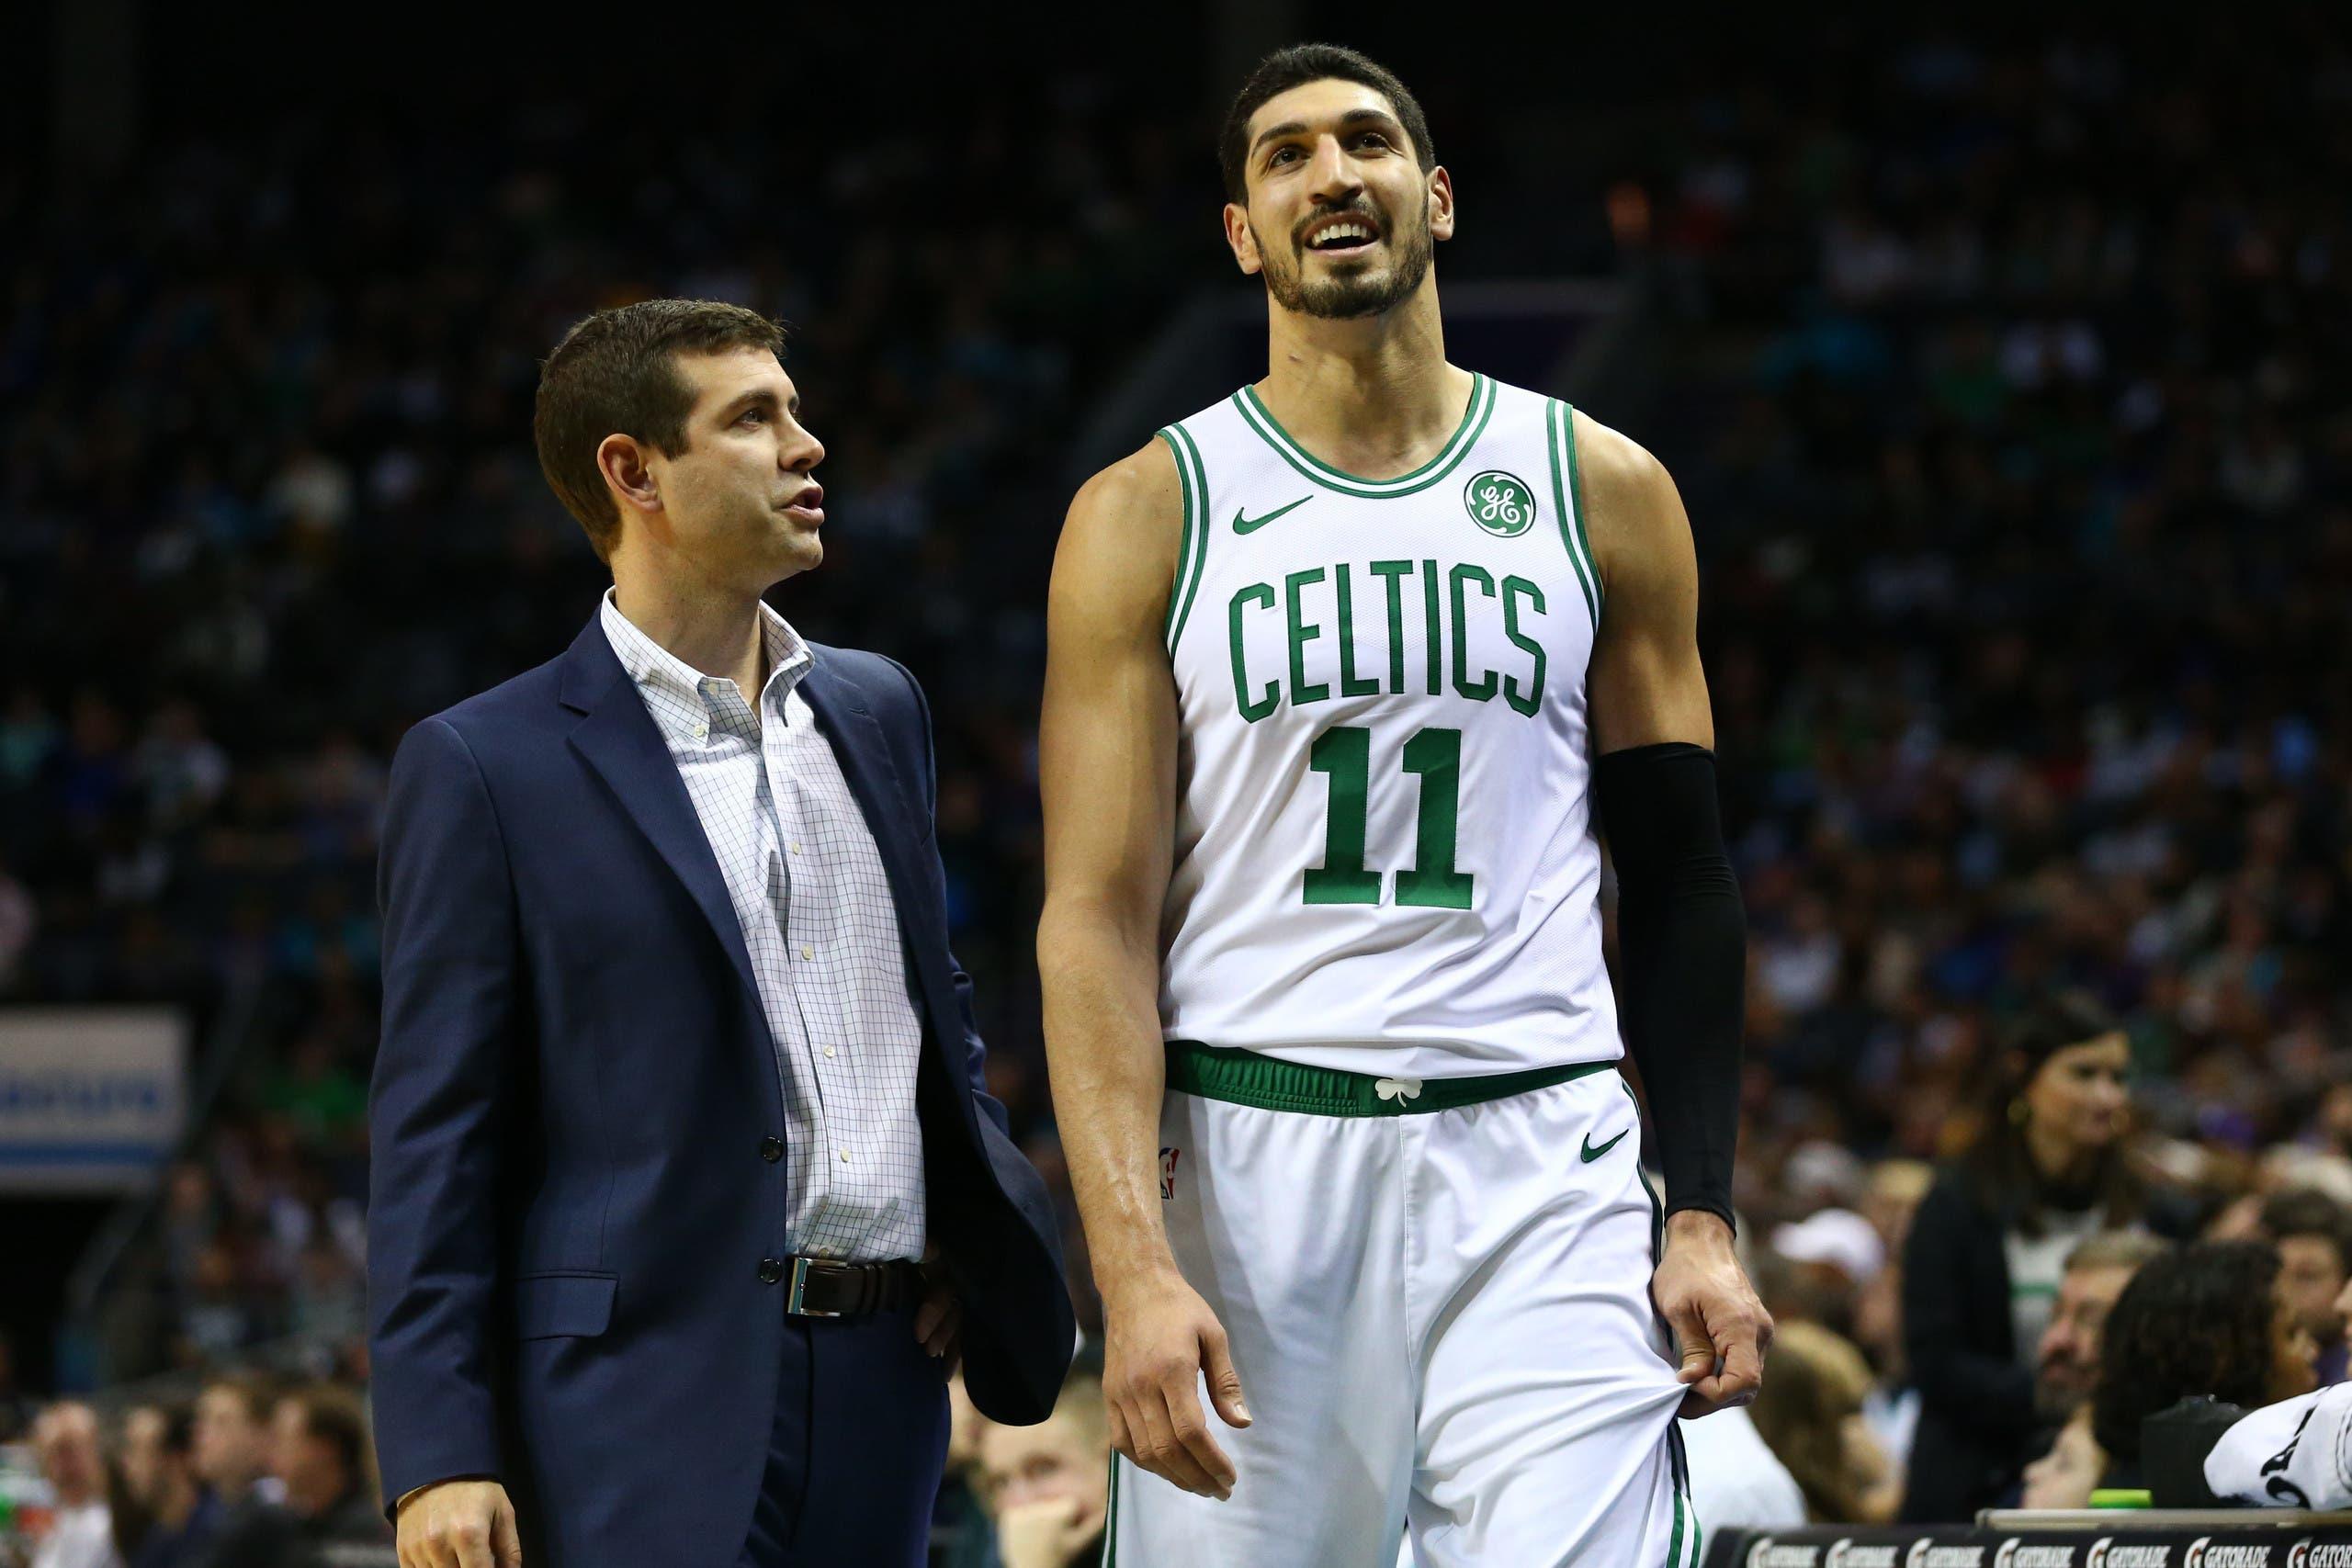 Boston Celtics center Enes Kanter talks with head coach Brad Stevens during the second half against the Charlotte Hornets at Spectrum Center. (Reuters)